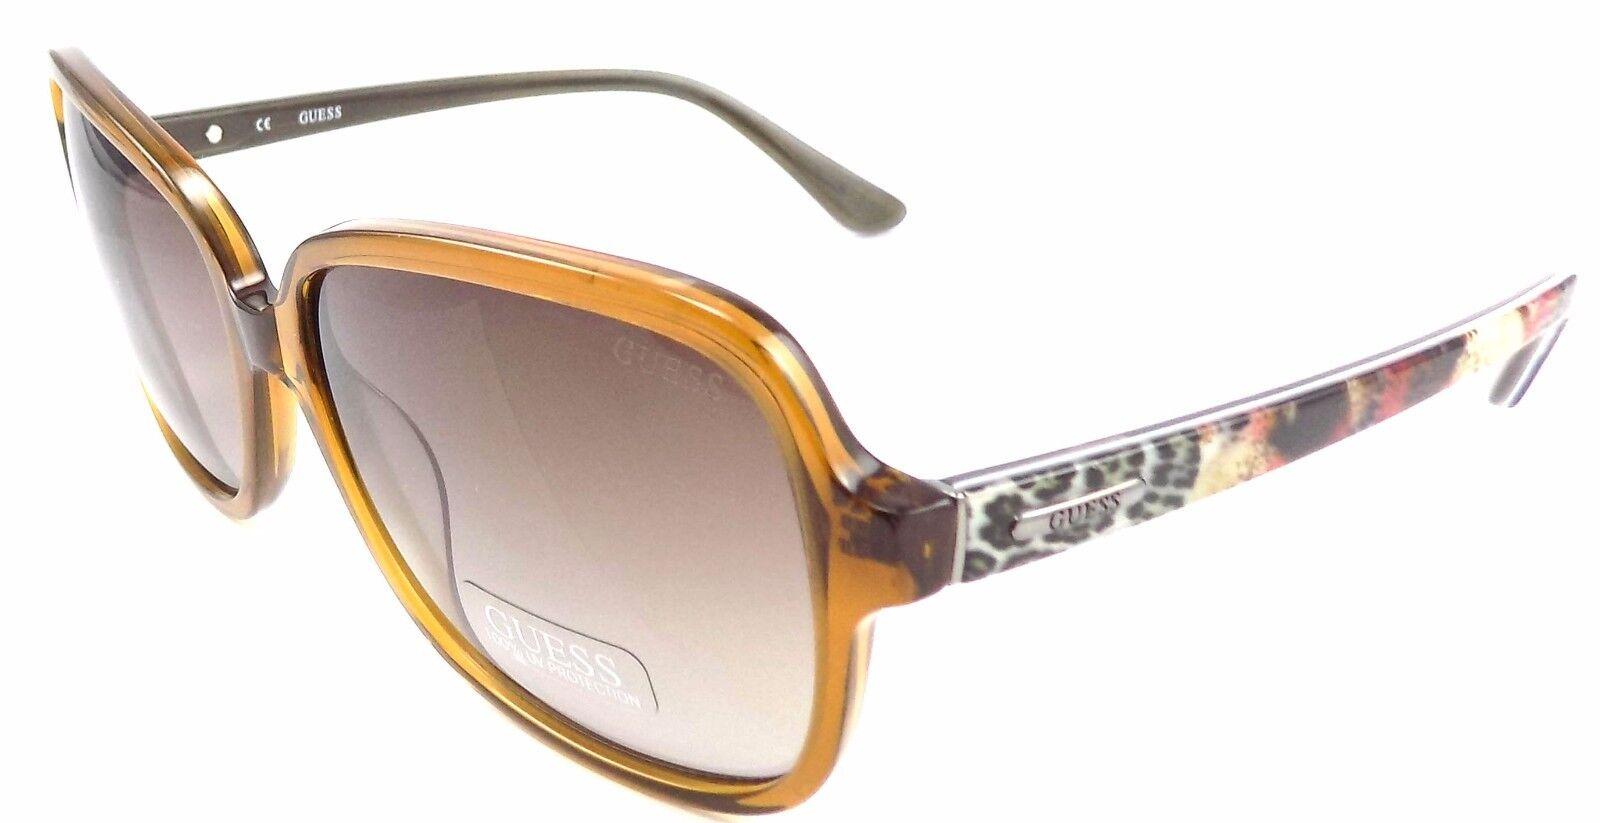 GUESS GU7382 45F Women's Sunglasses 60-16-135 Shiny Light Brown / Brown Gradient